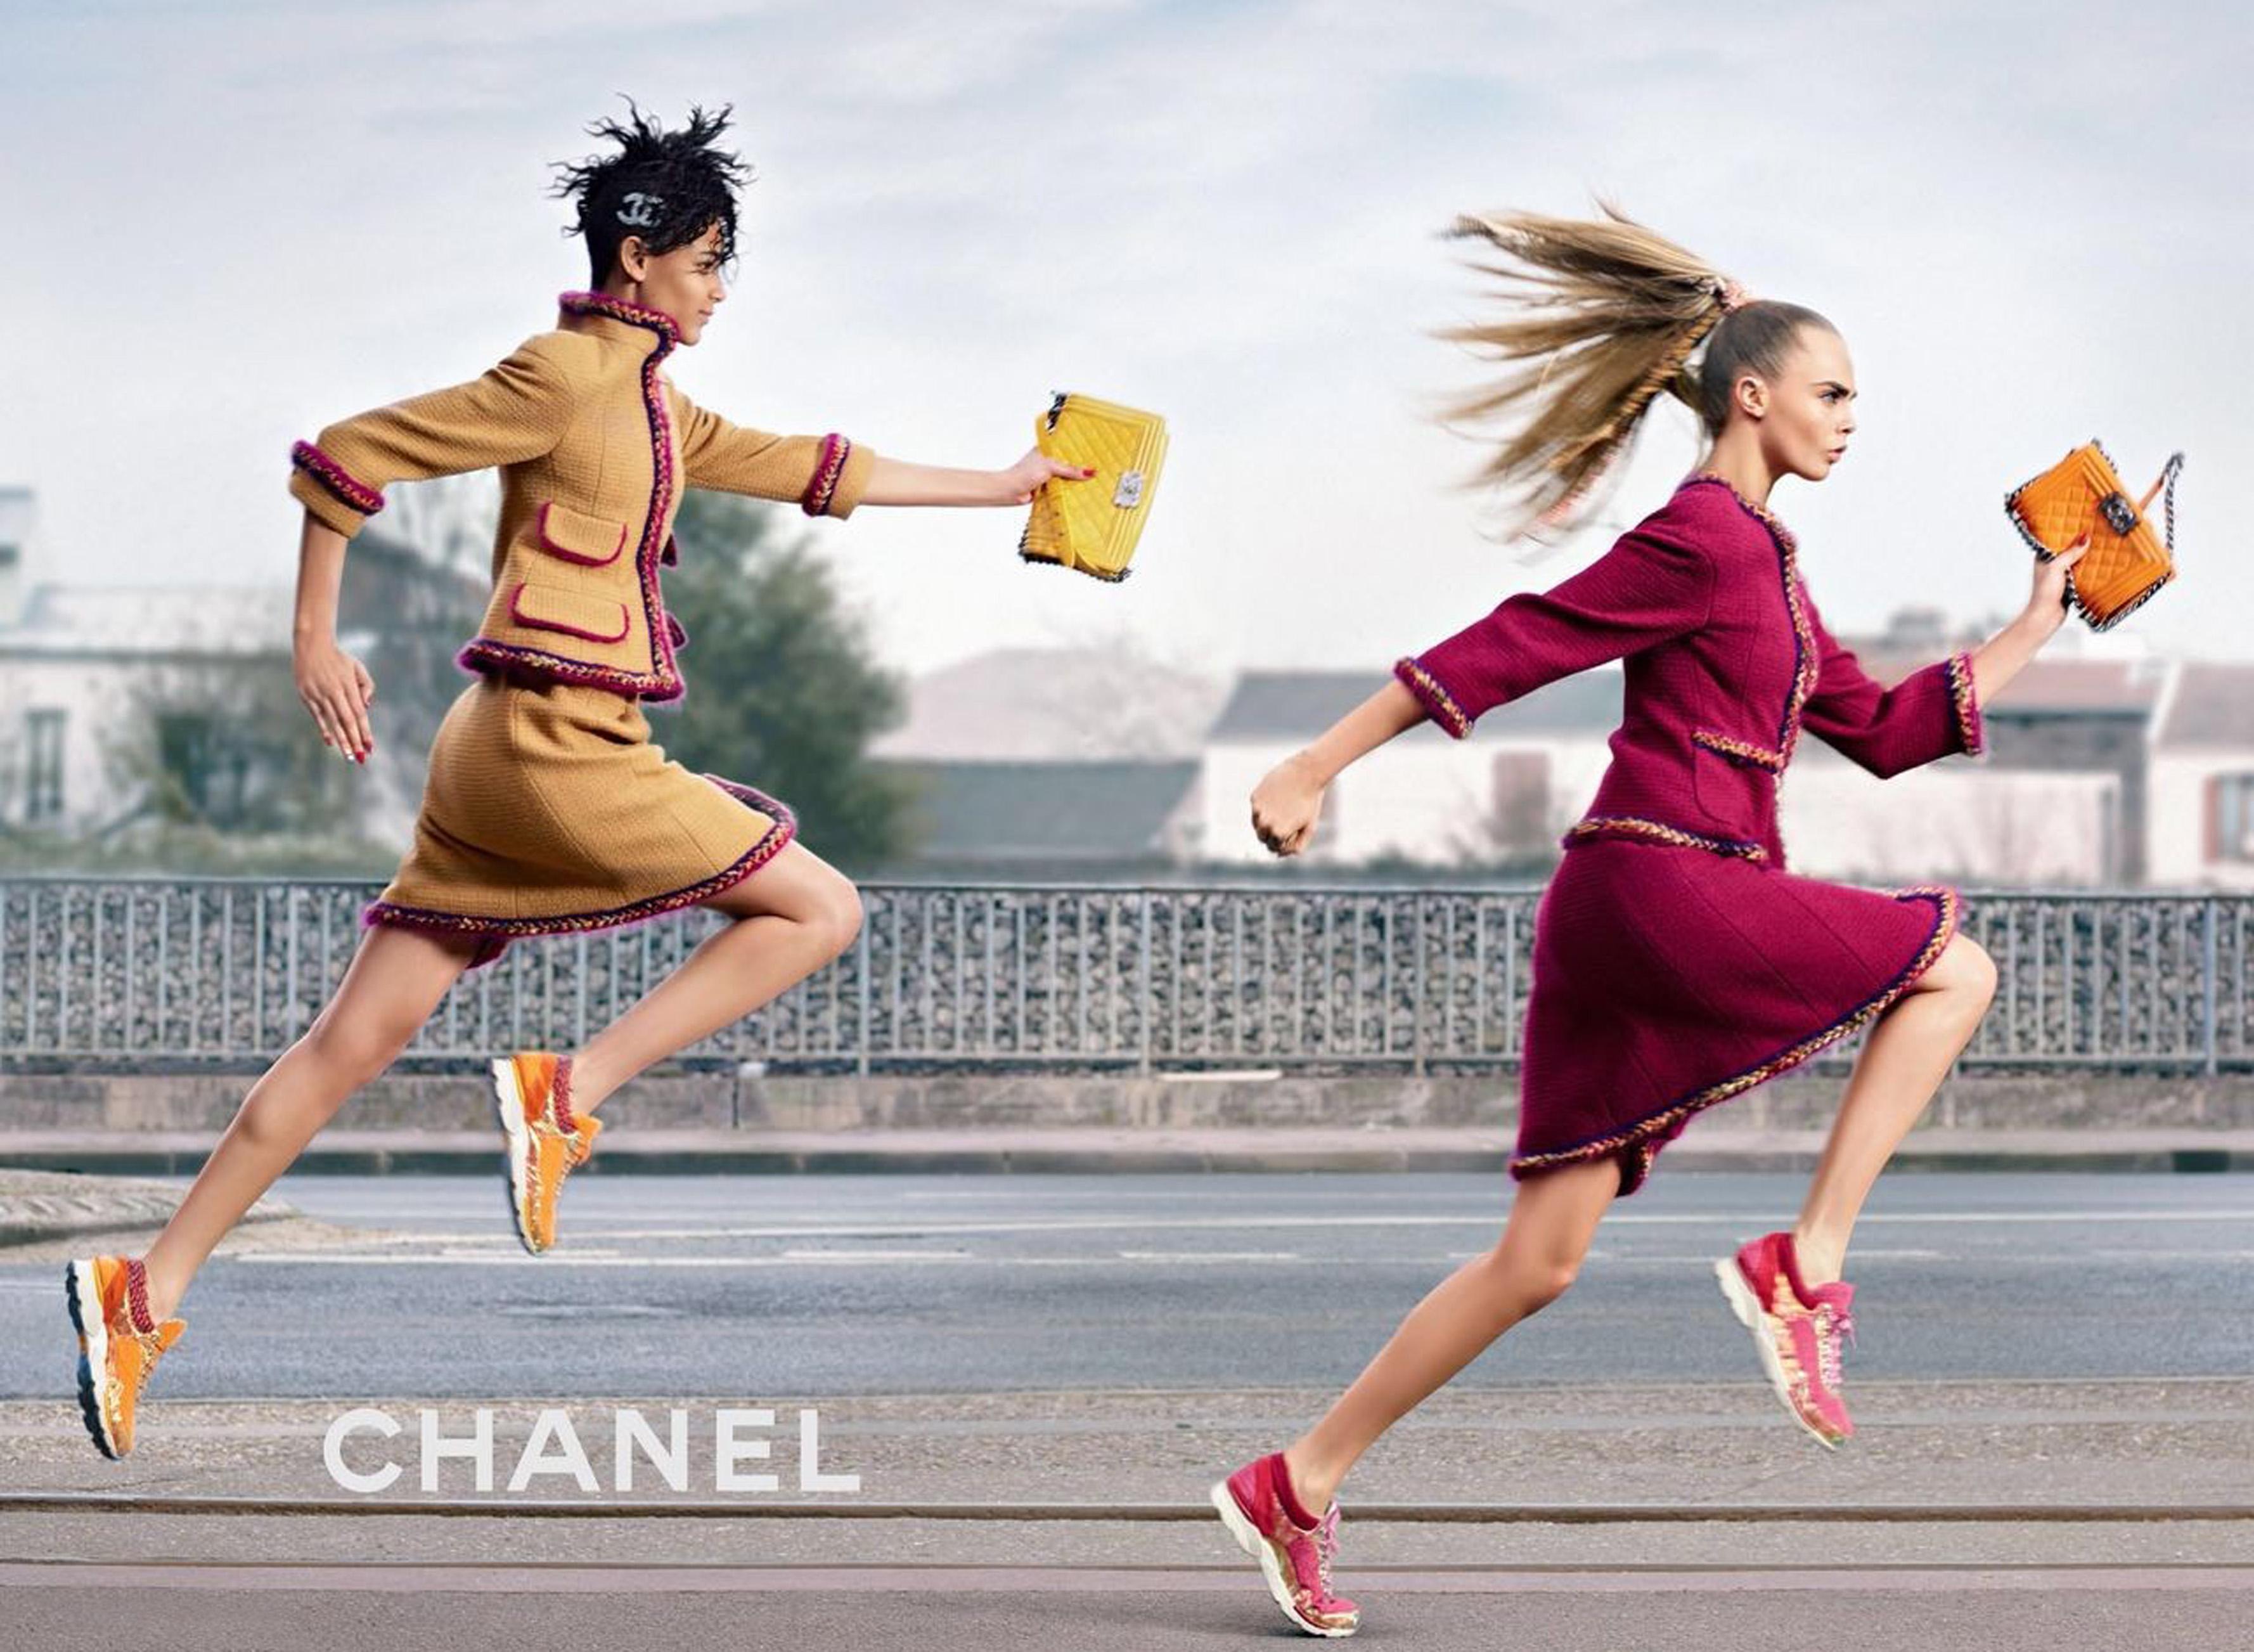 Coco Coach – Campania Chanel FW 2014 by Karl Lagerfeld